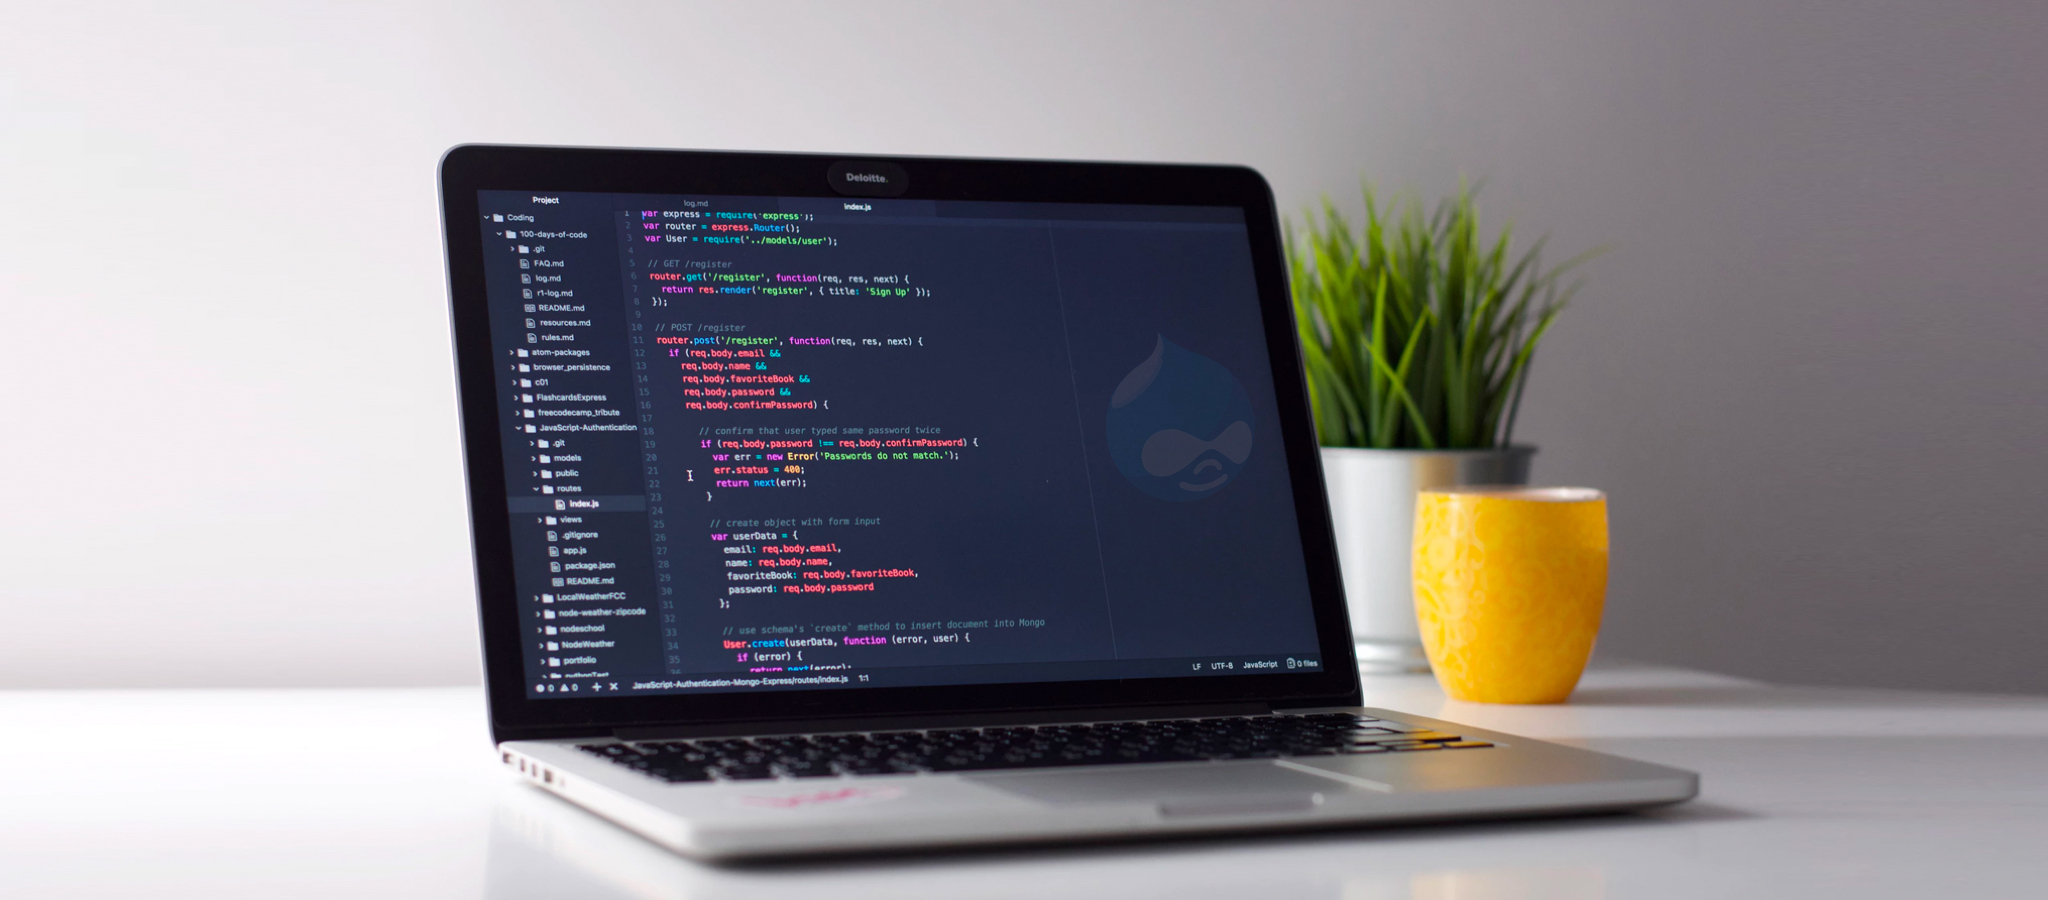 Drupal Web Development Company | Hire Drupal Developers